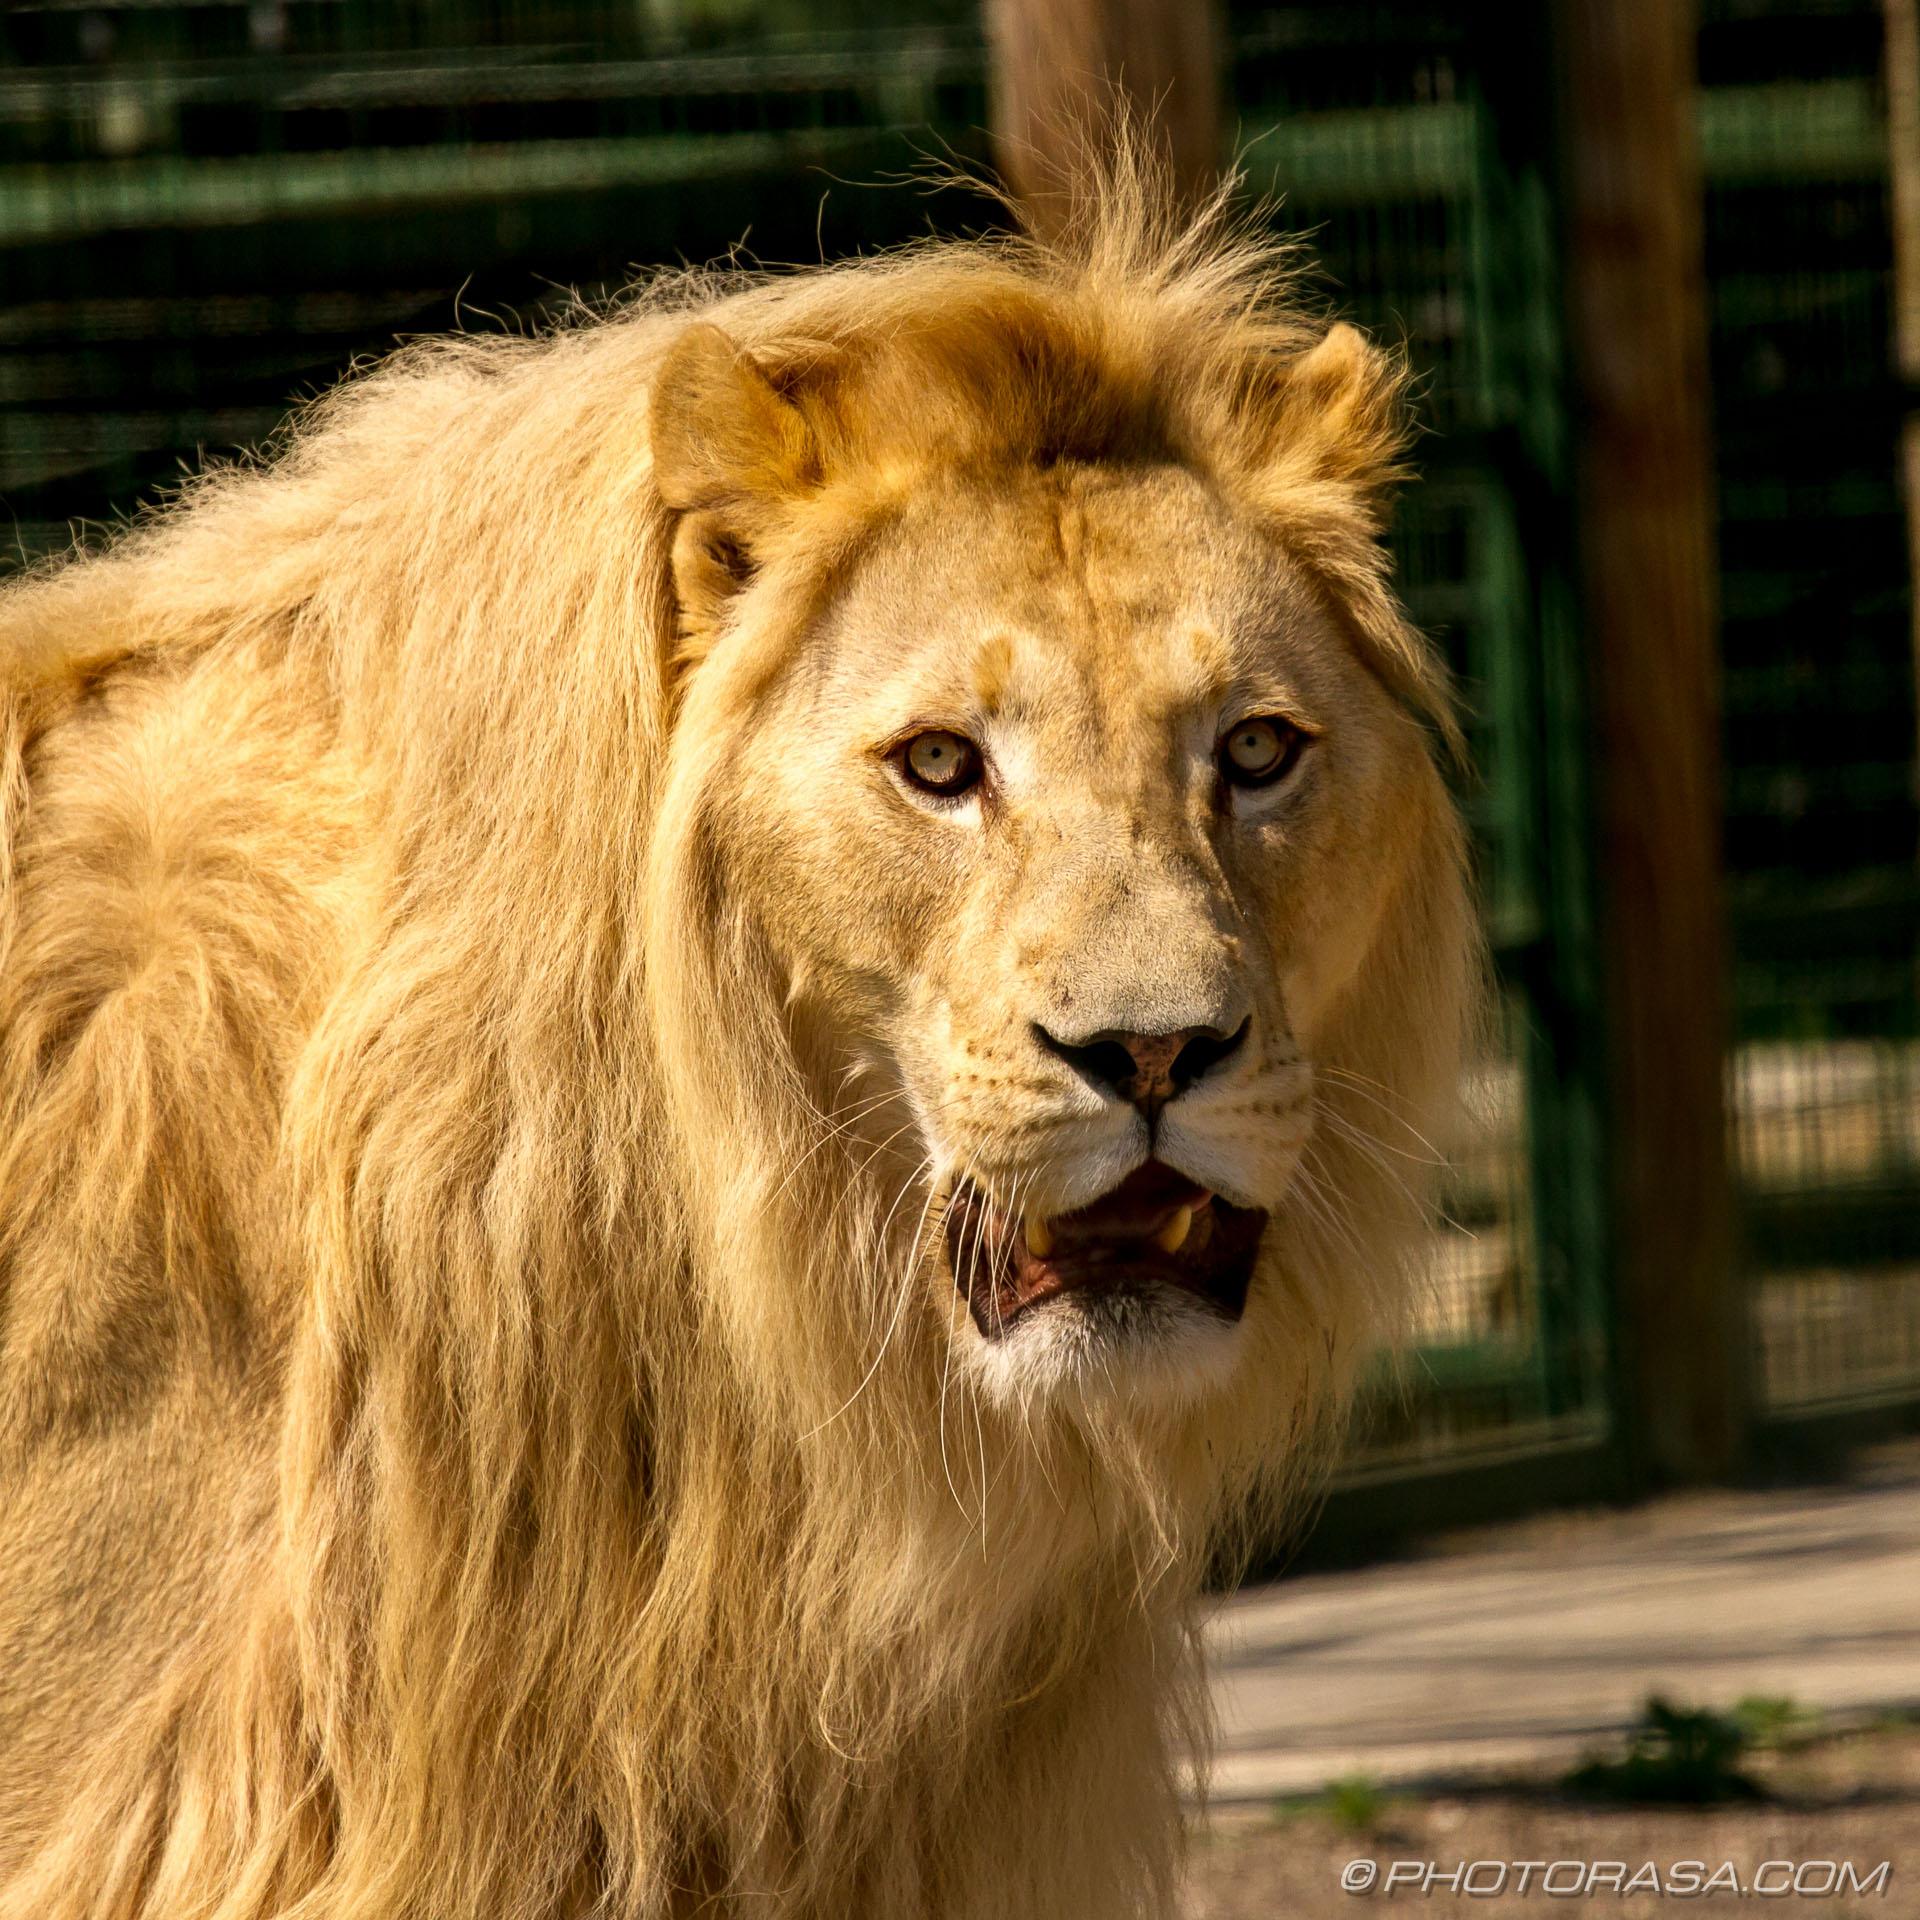 http://photorasa.com/white-lion/white-lion-mane/